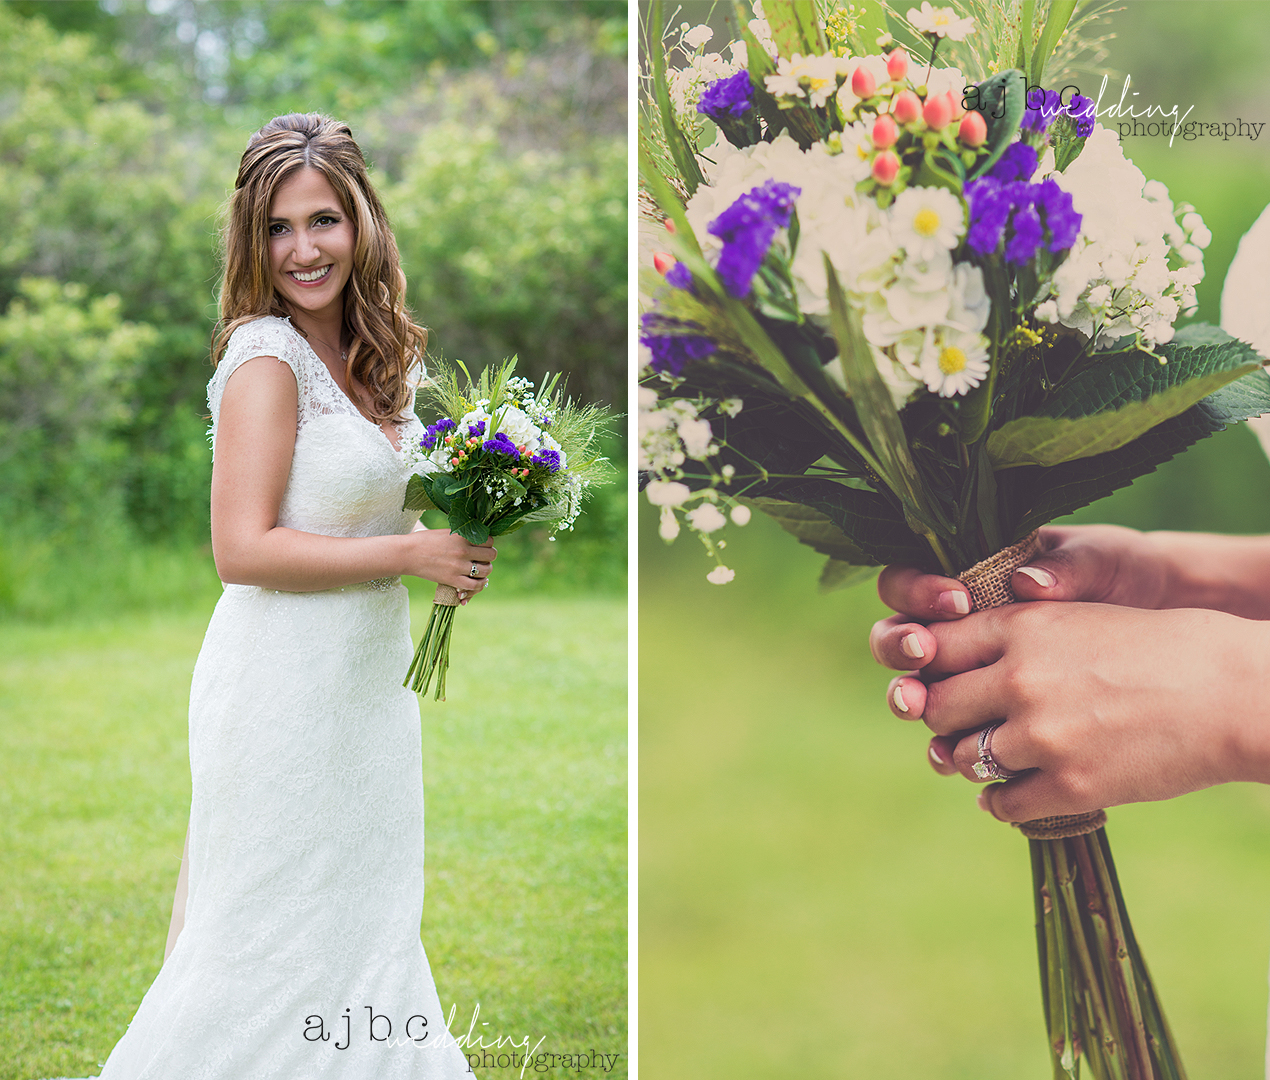 ajbcphotography-port-huron-michigan-wedding-photographer-outdoors-summer-wedding-country-wedding-wadhams-michigan-bride.jpg